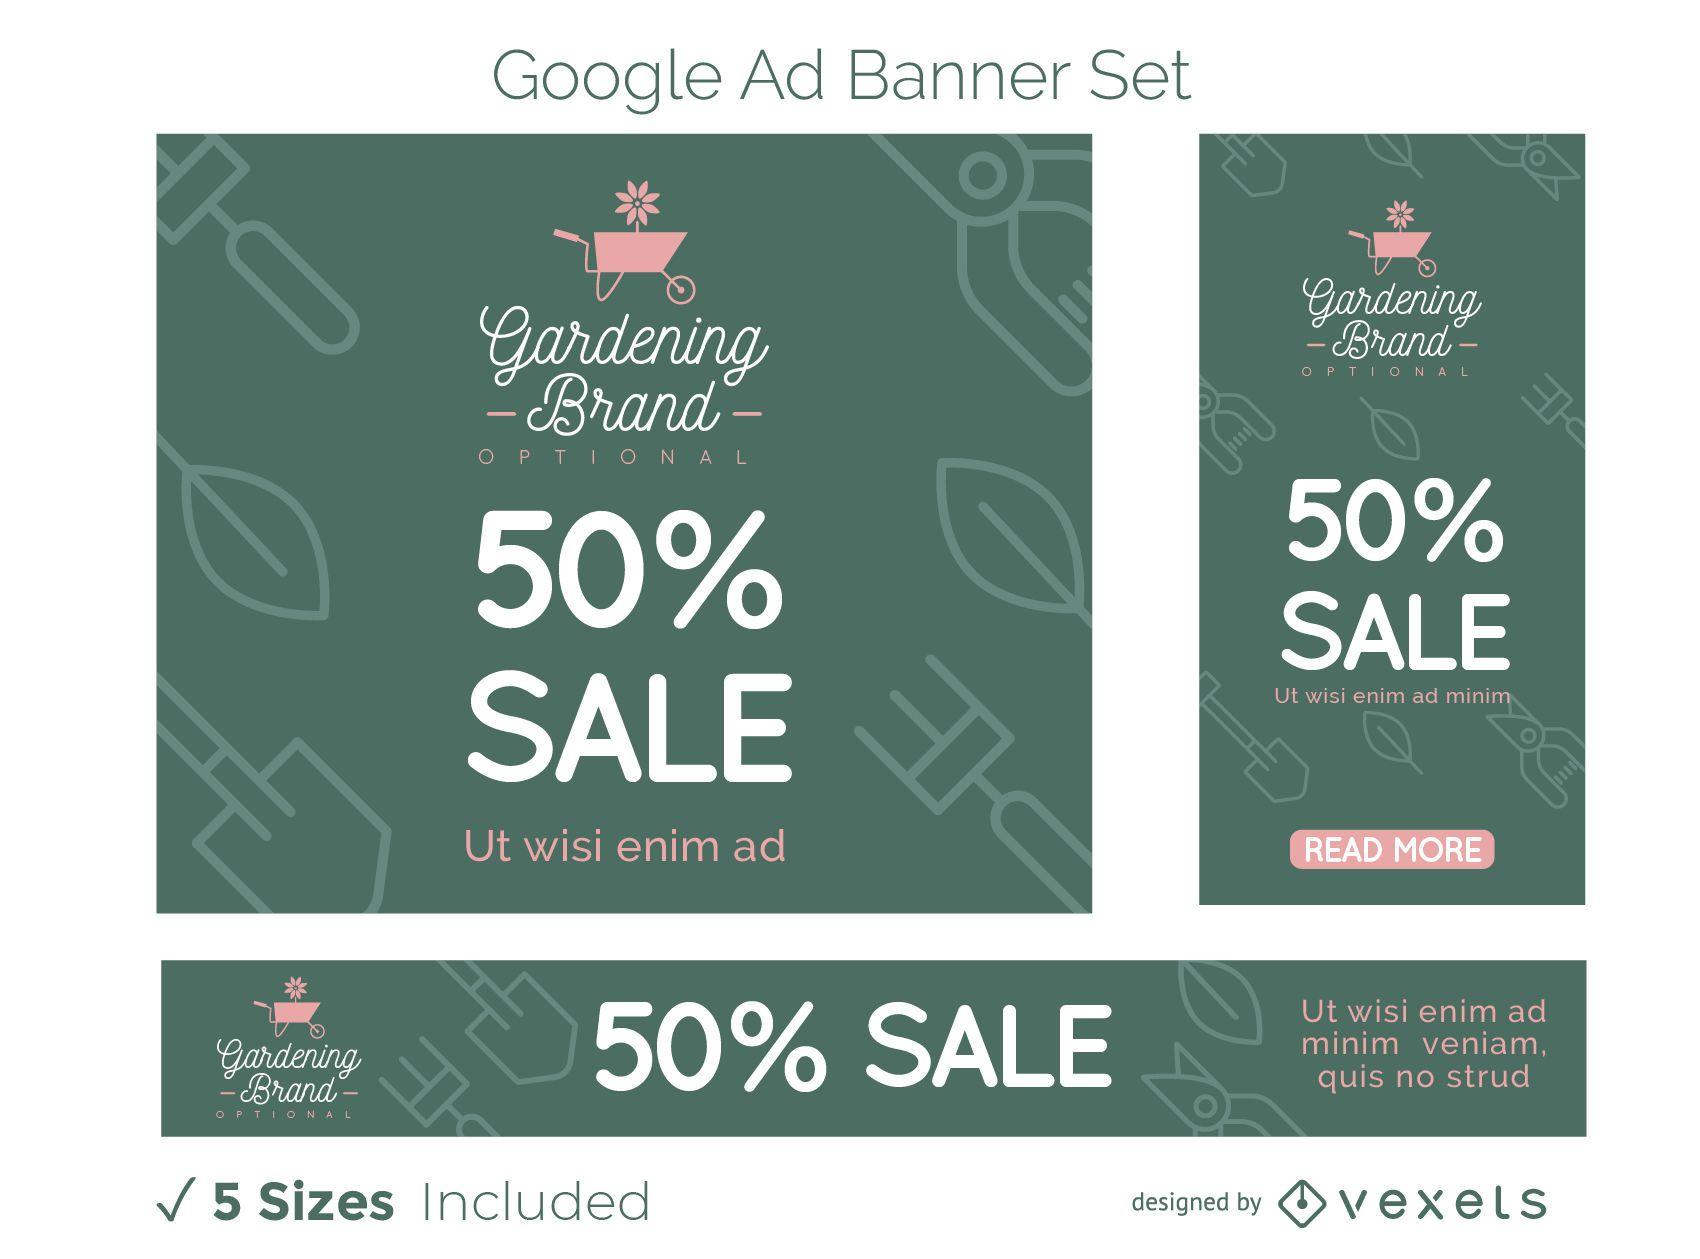 Gardening Business Google Ads Banner Set